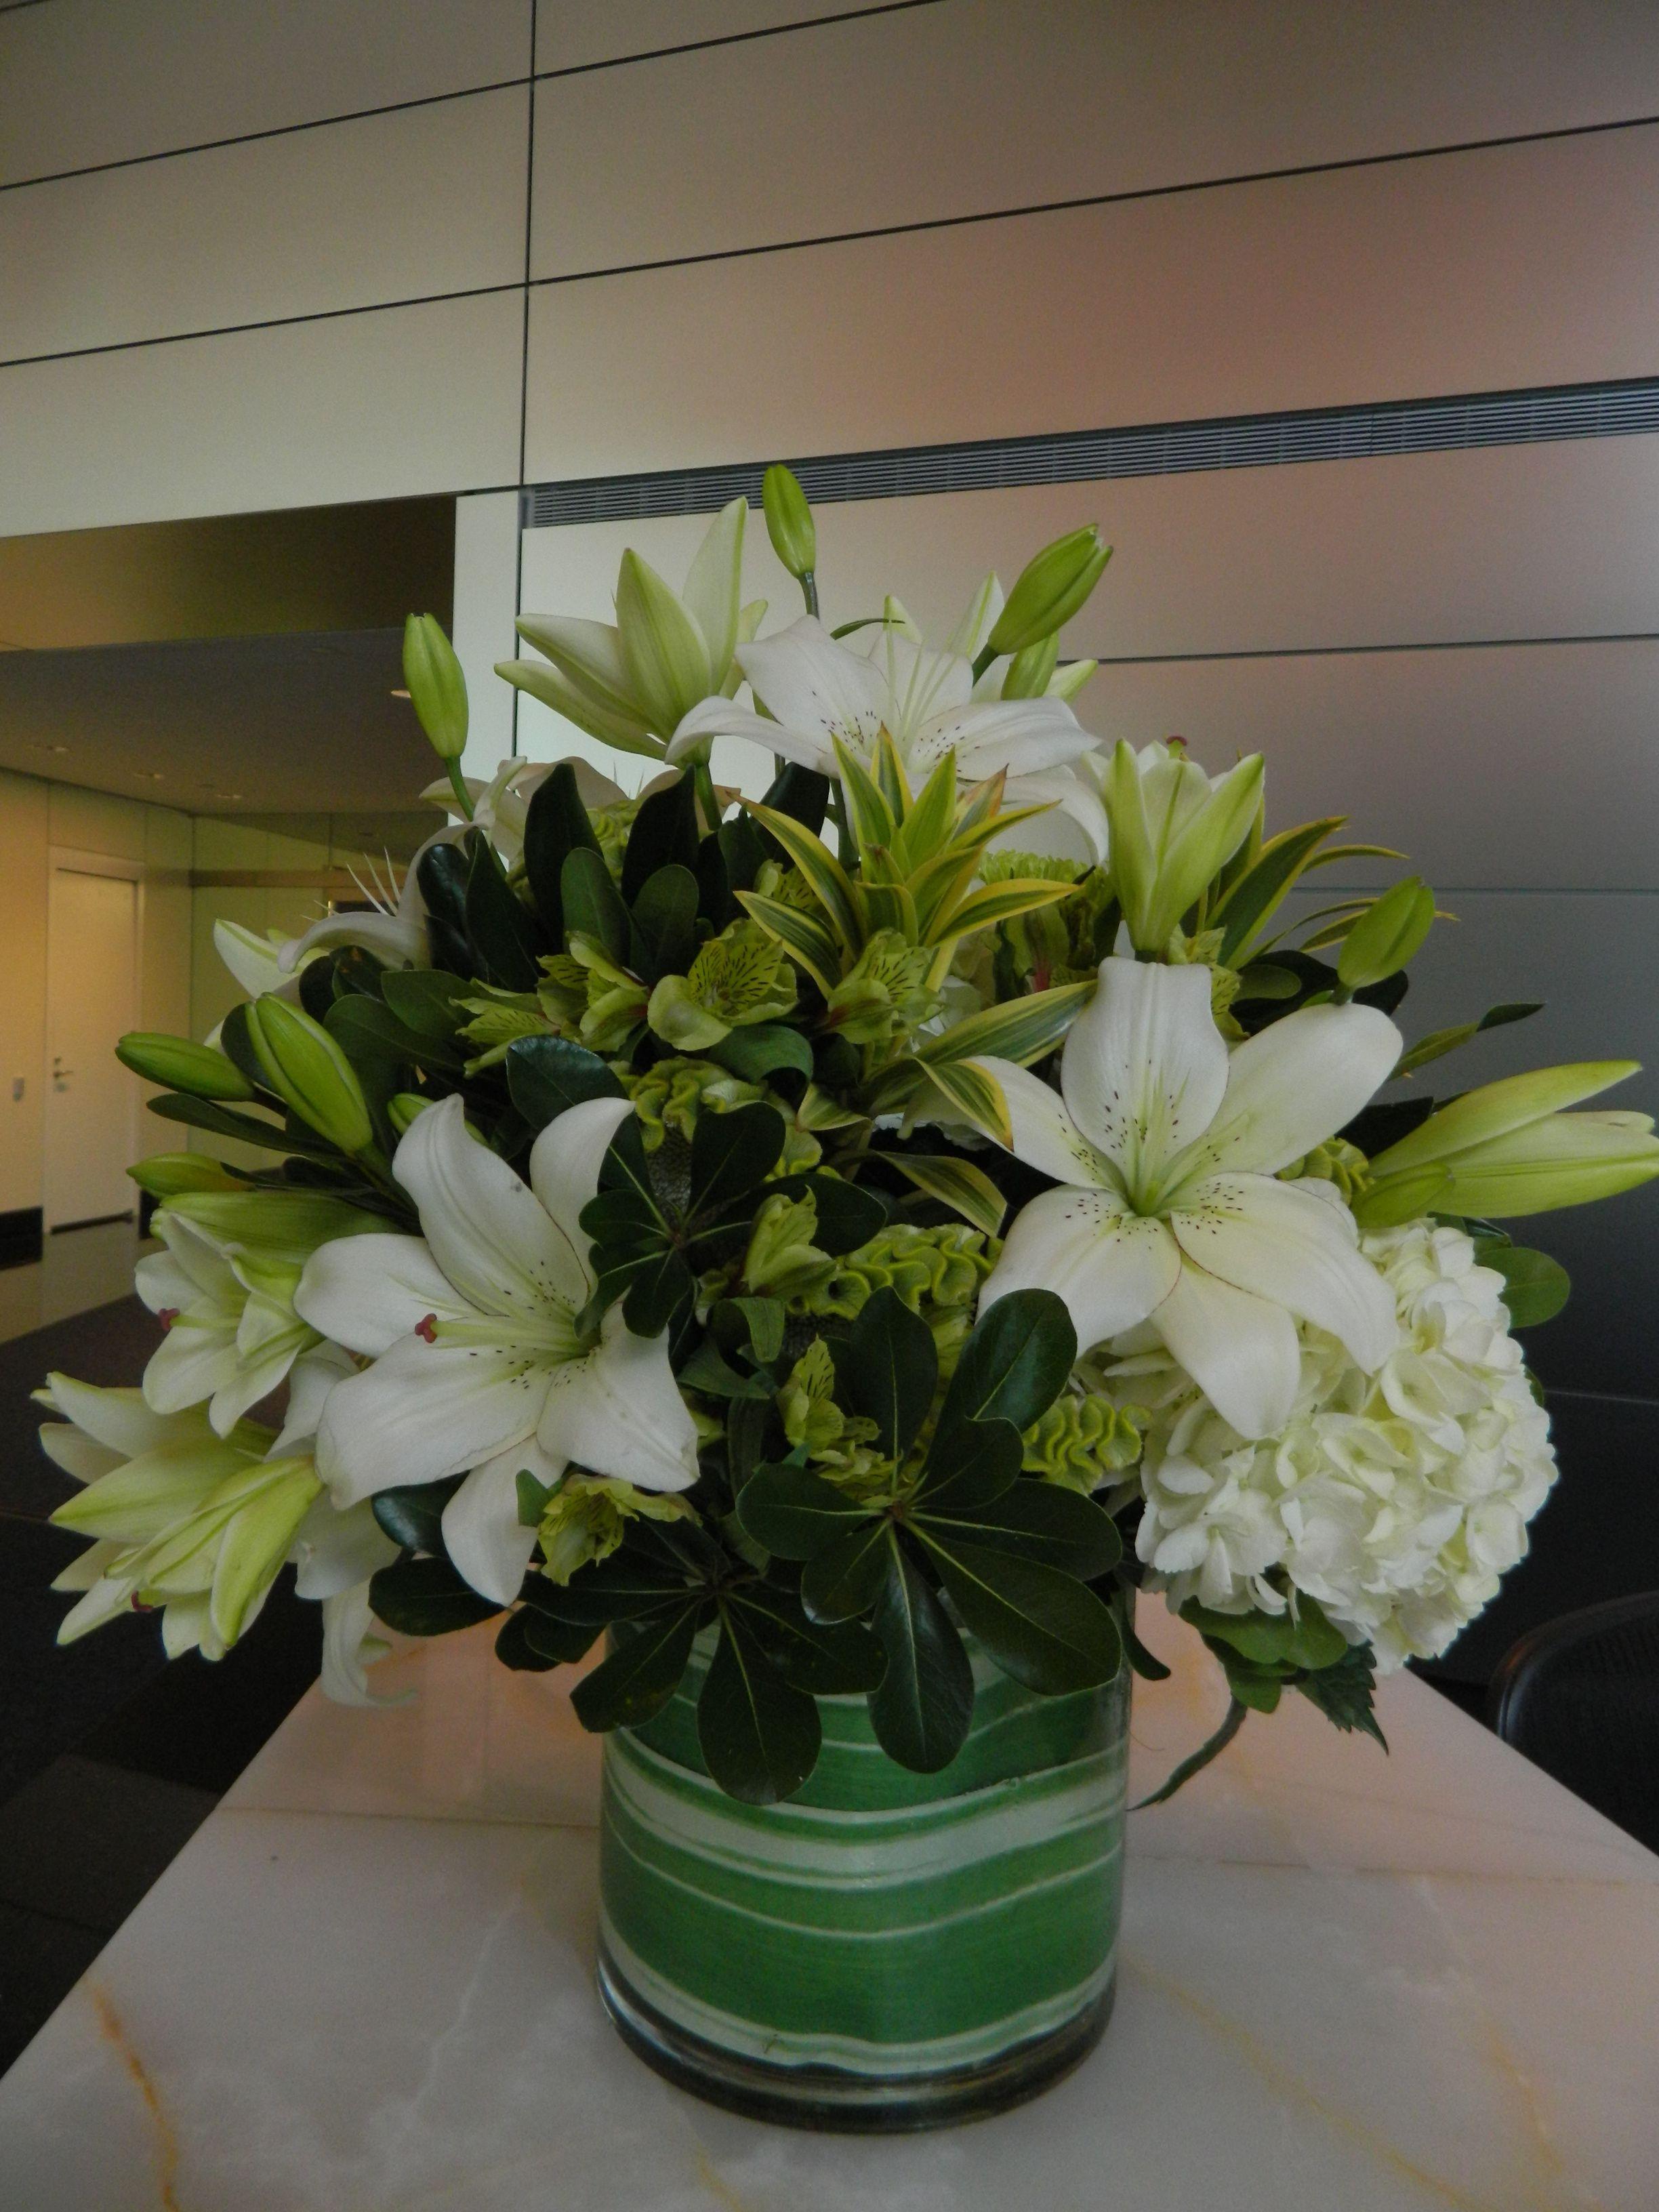 Eyelash lily green celoscia white hydrangea white eyelash lily green celoscia white hydrangea izmirmasajfo